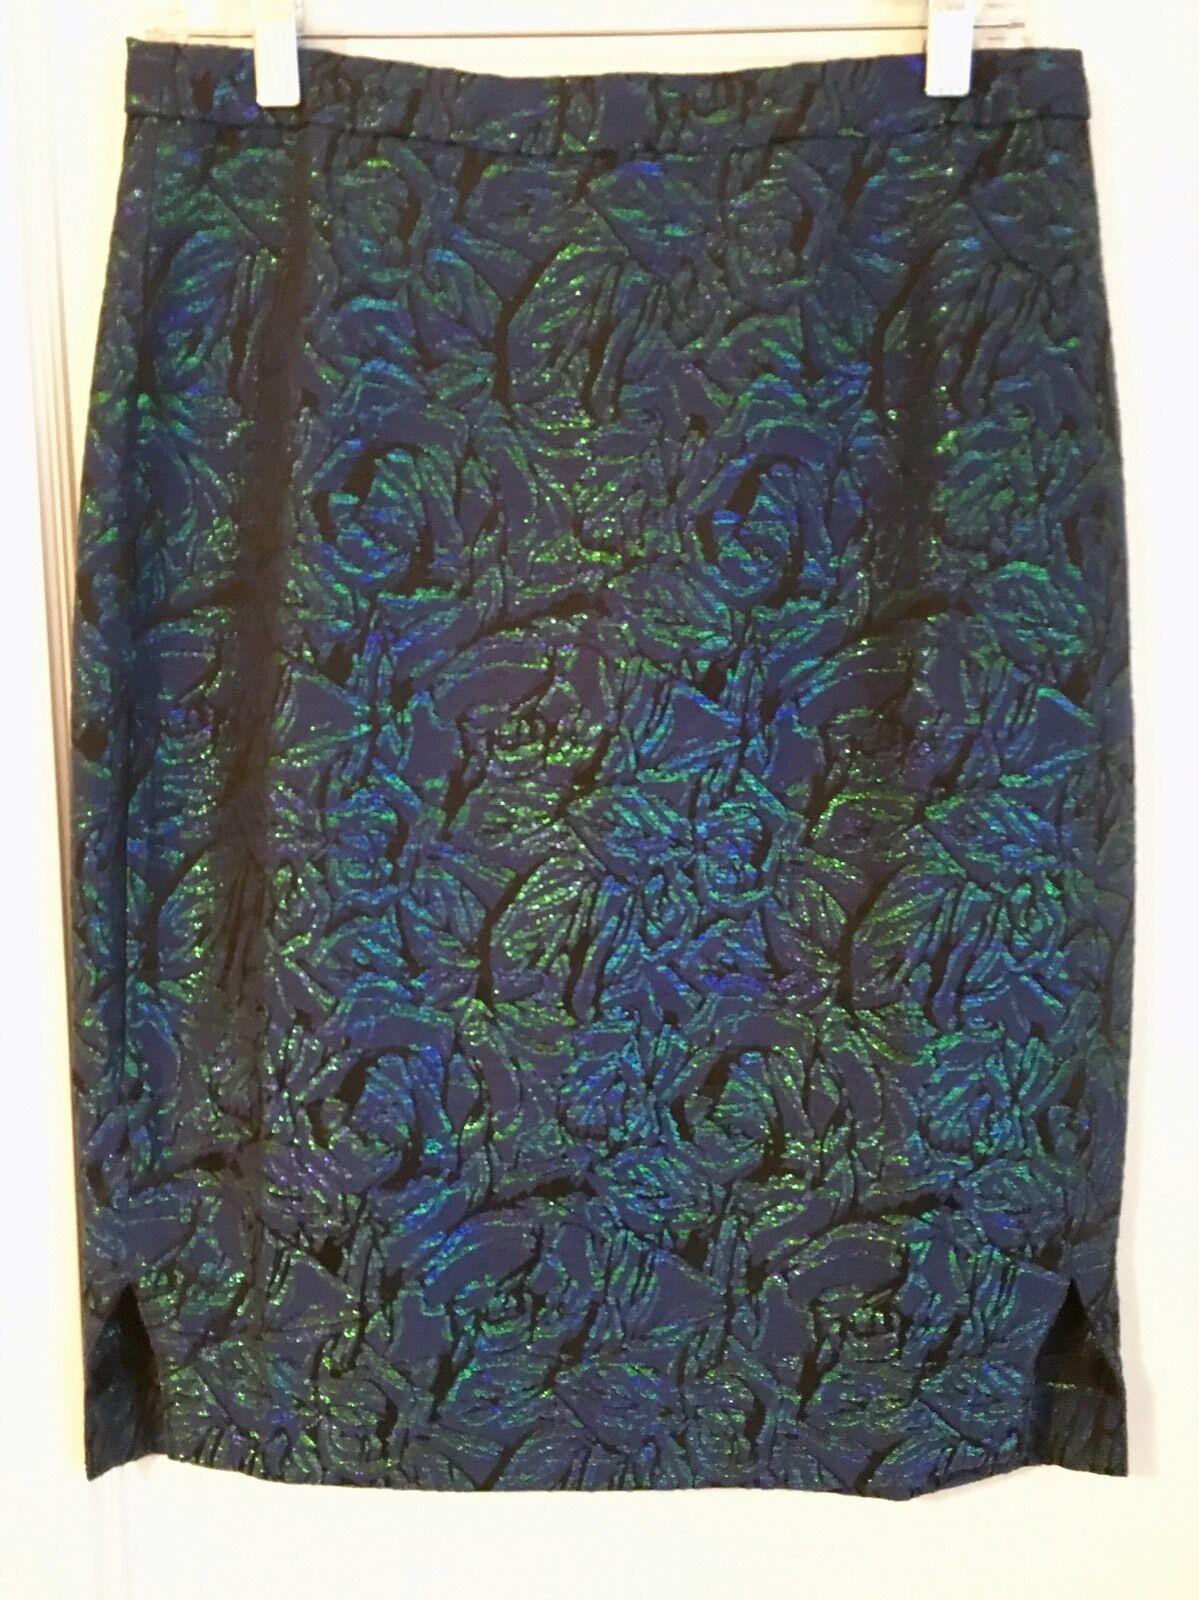 J CREW Pencil Skirt Metallic Jacquard sz 6 Brocade bluee Purple Green C9156 NEW